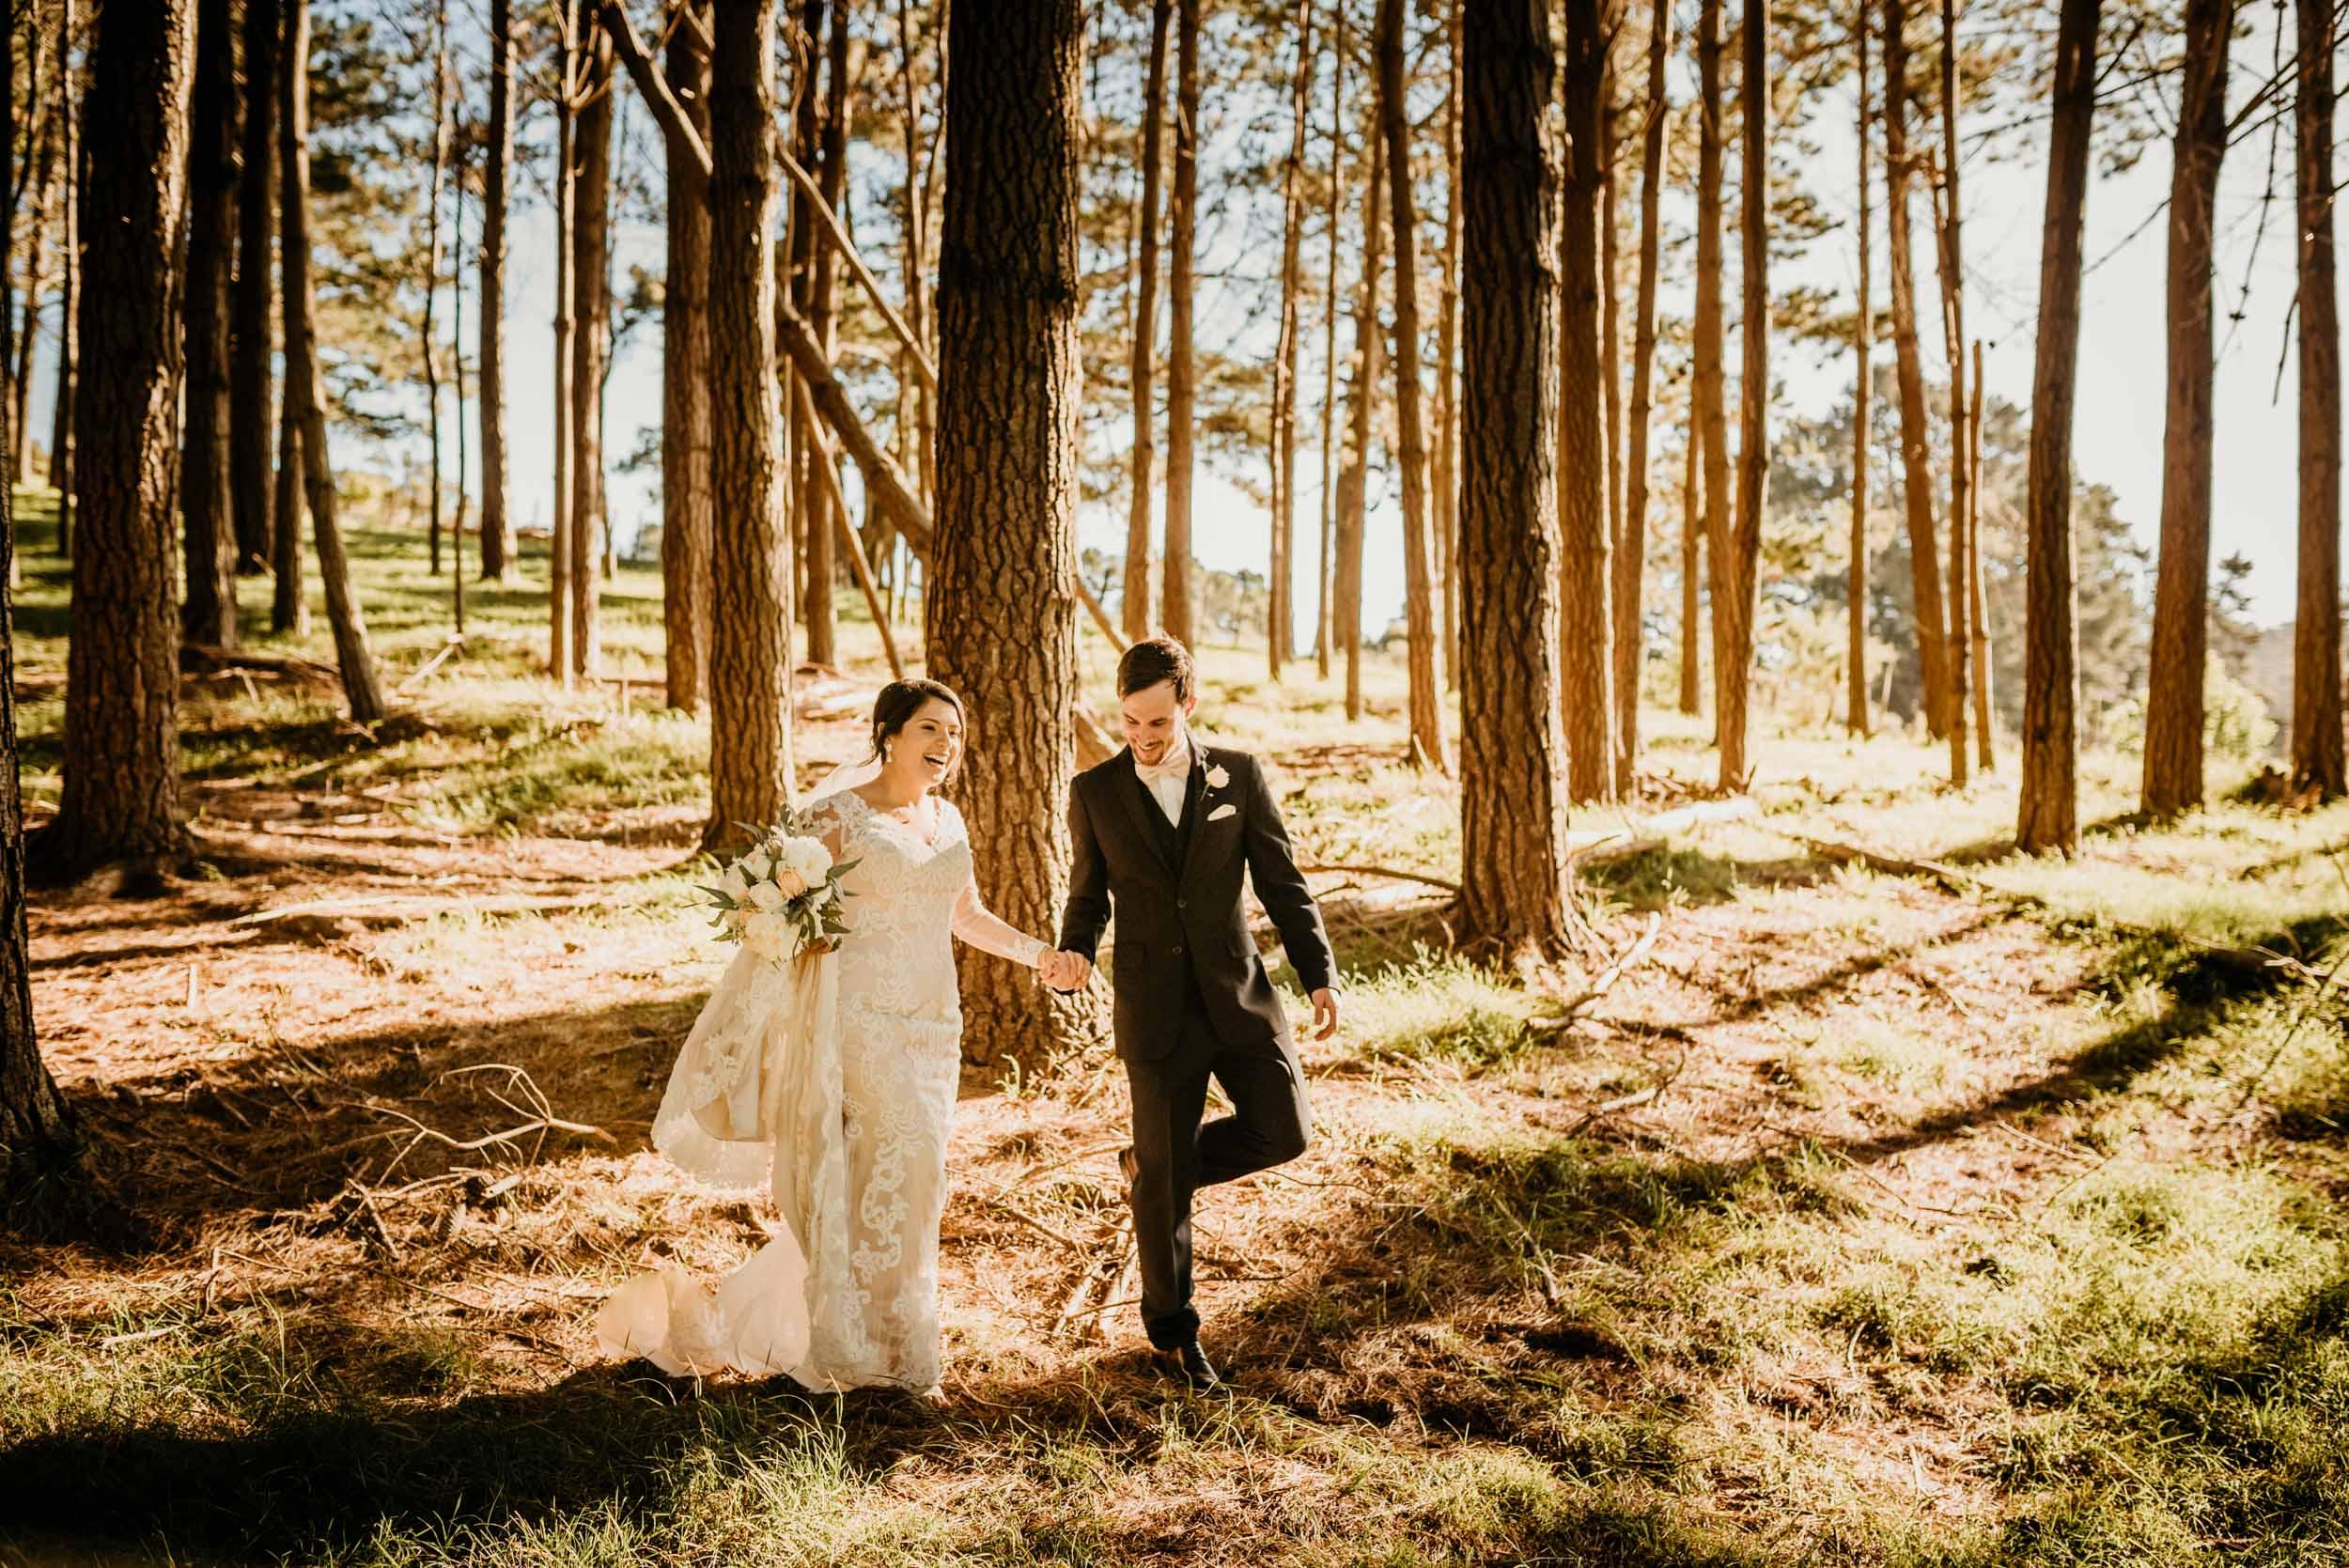 The Raw Photographer - Cairns Wedding Photographer - New Zealand Destination Photography - Travel - Australian-17.jpg